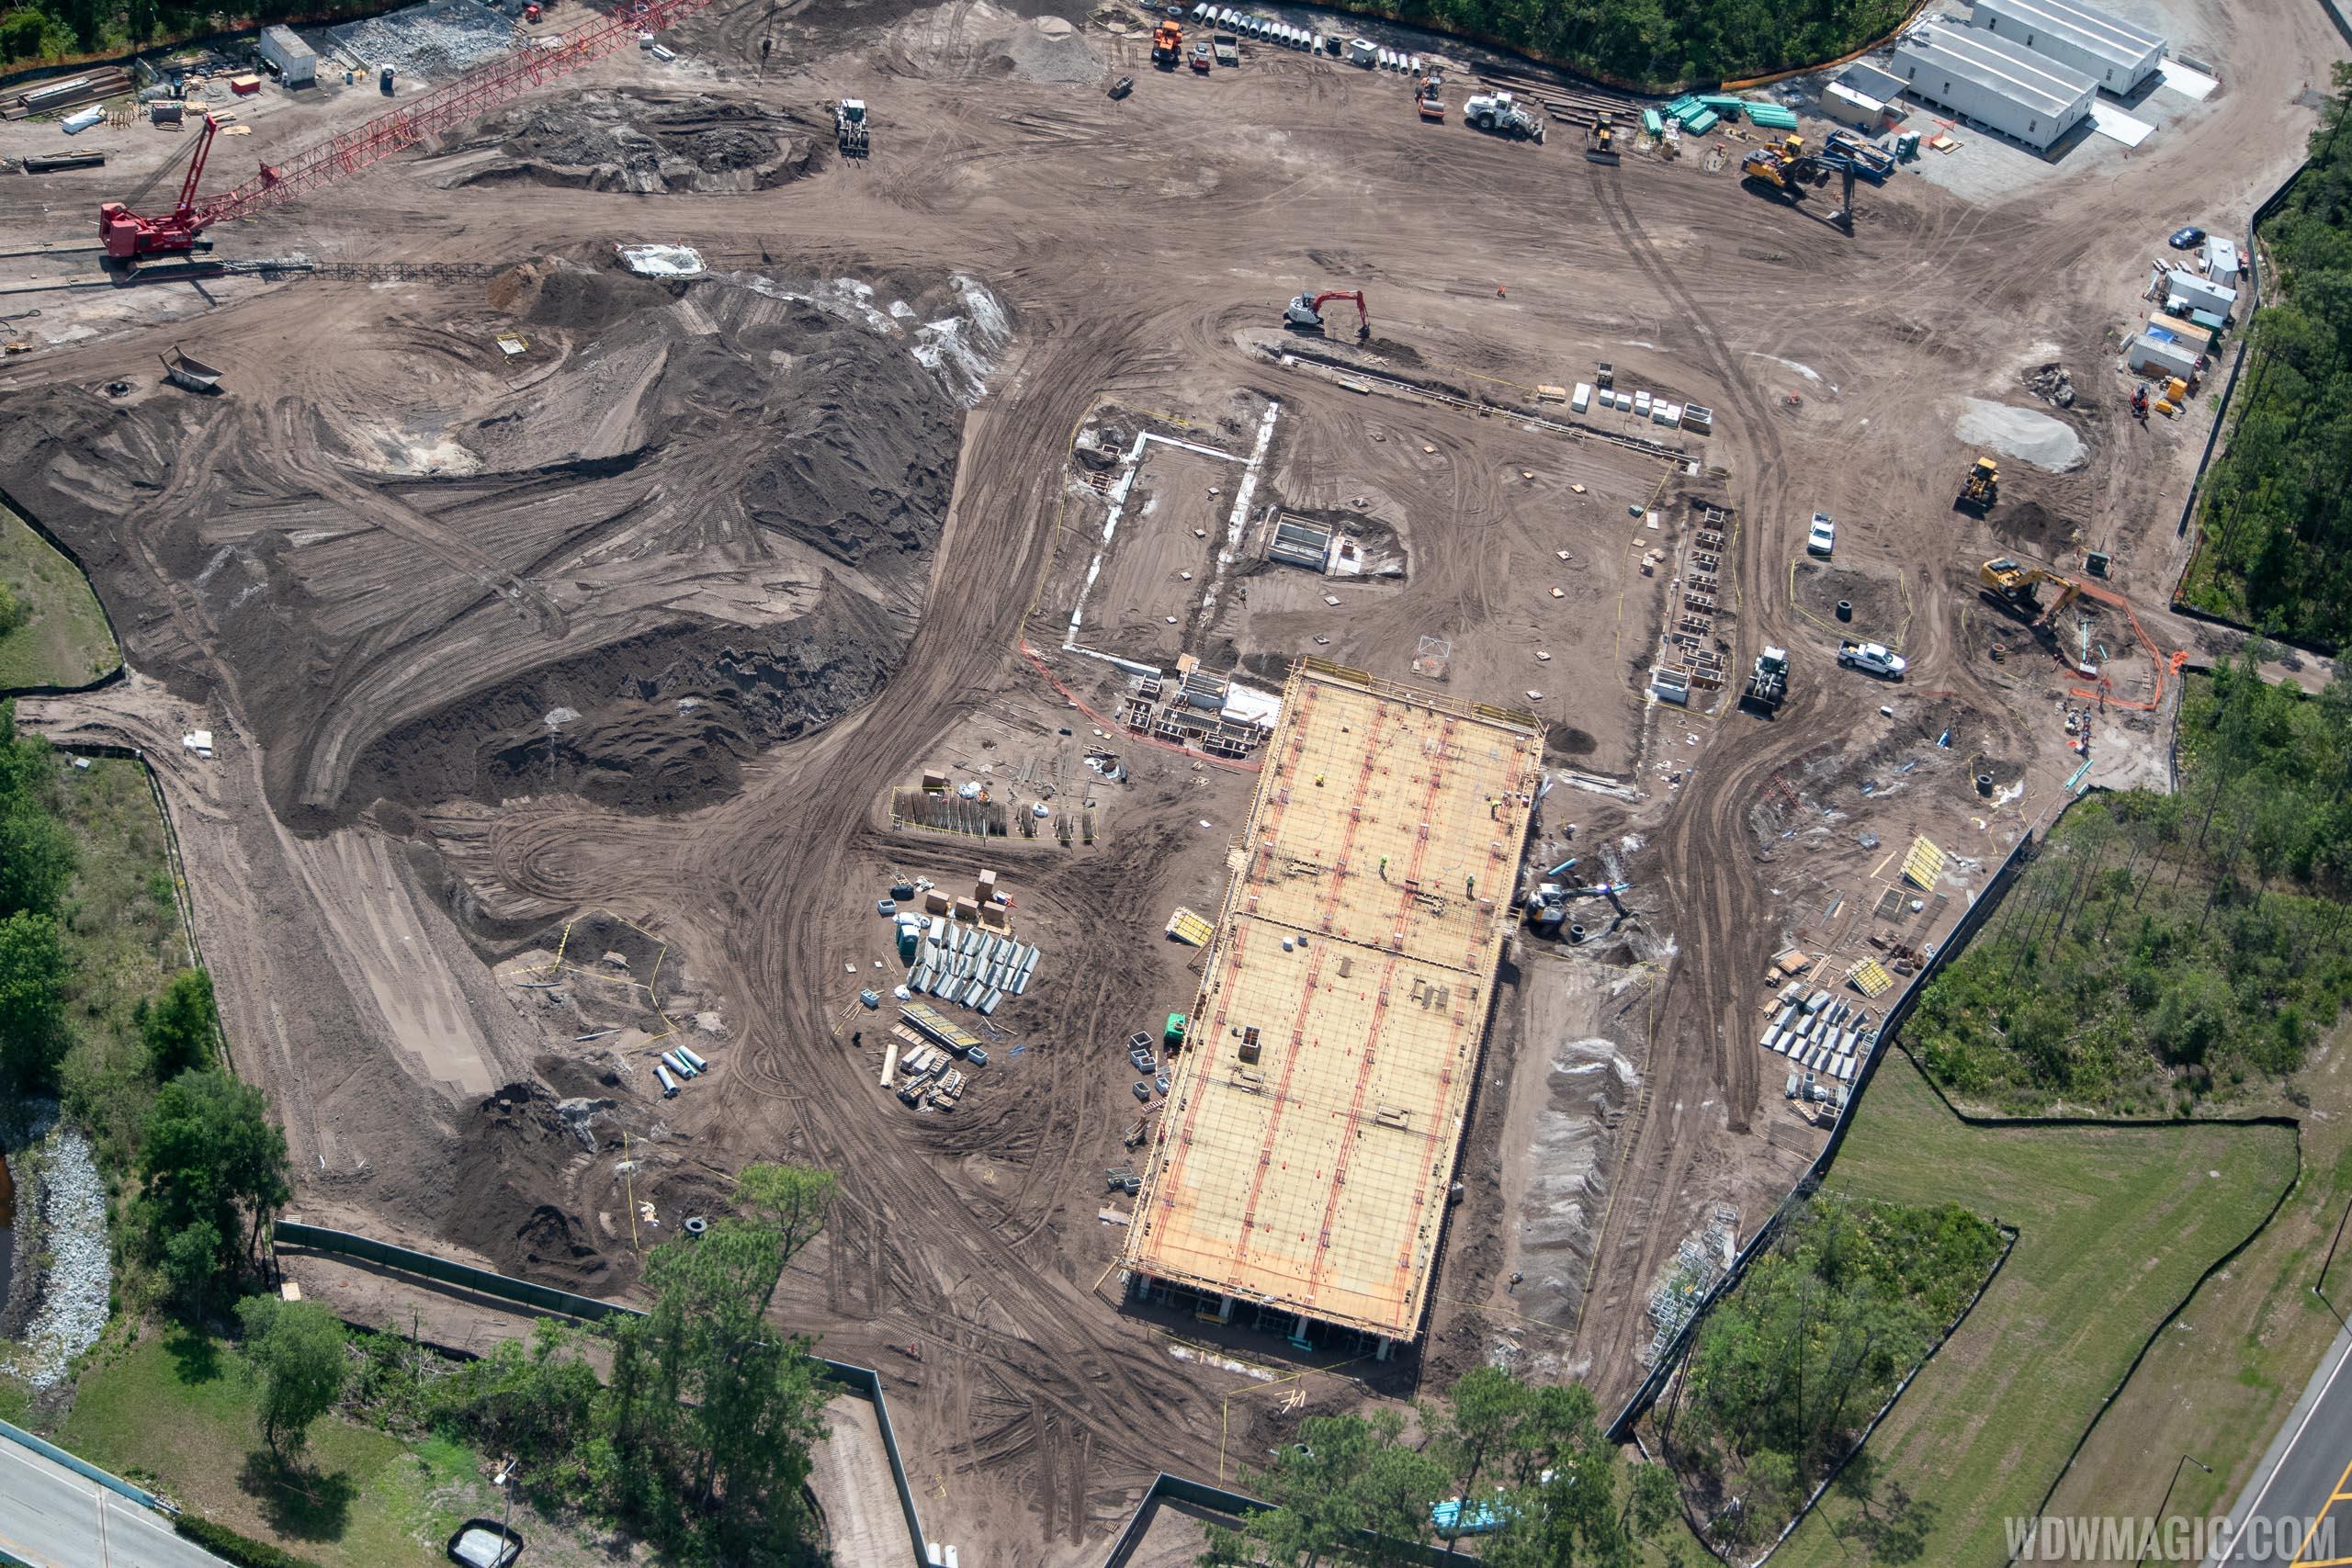 Star Wars hotel construction at Walt Disney World - May 2019